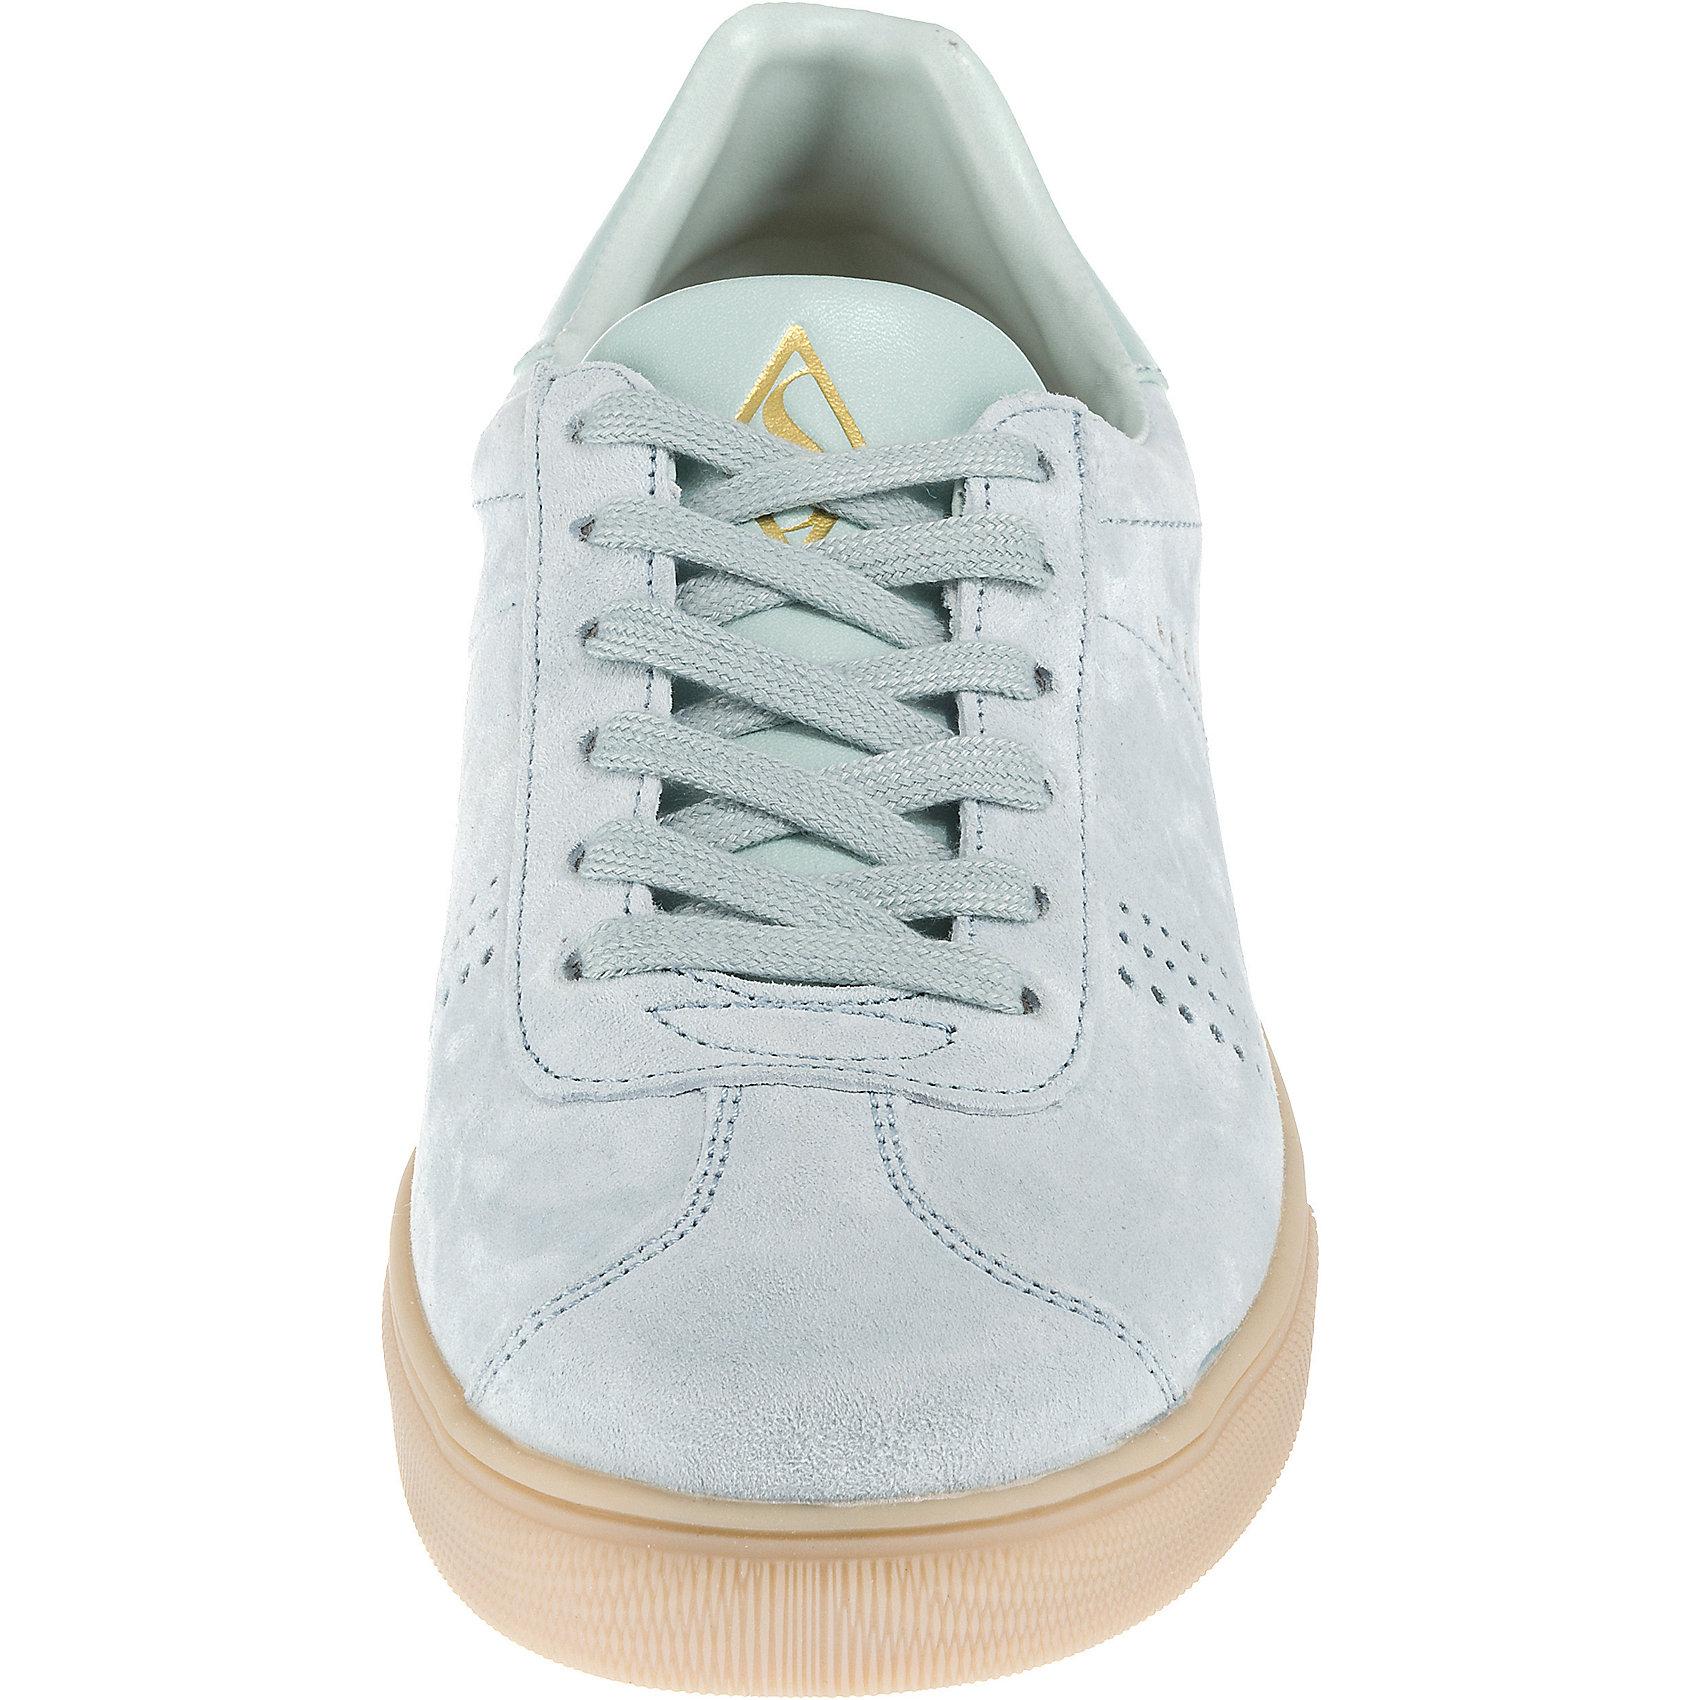 wholesale dealer cd573 a0101 ...  110 Nike Air Berwuda Casual Running Shoes Black Black Black Anthracite  White Sz 9 555305 d58f3e ...